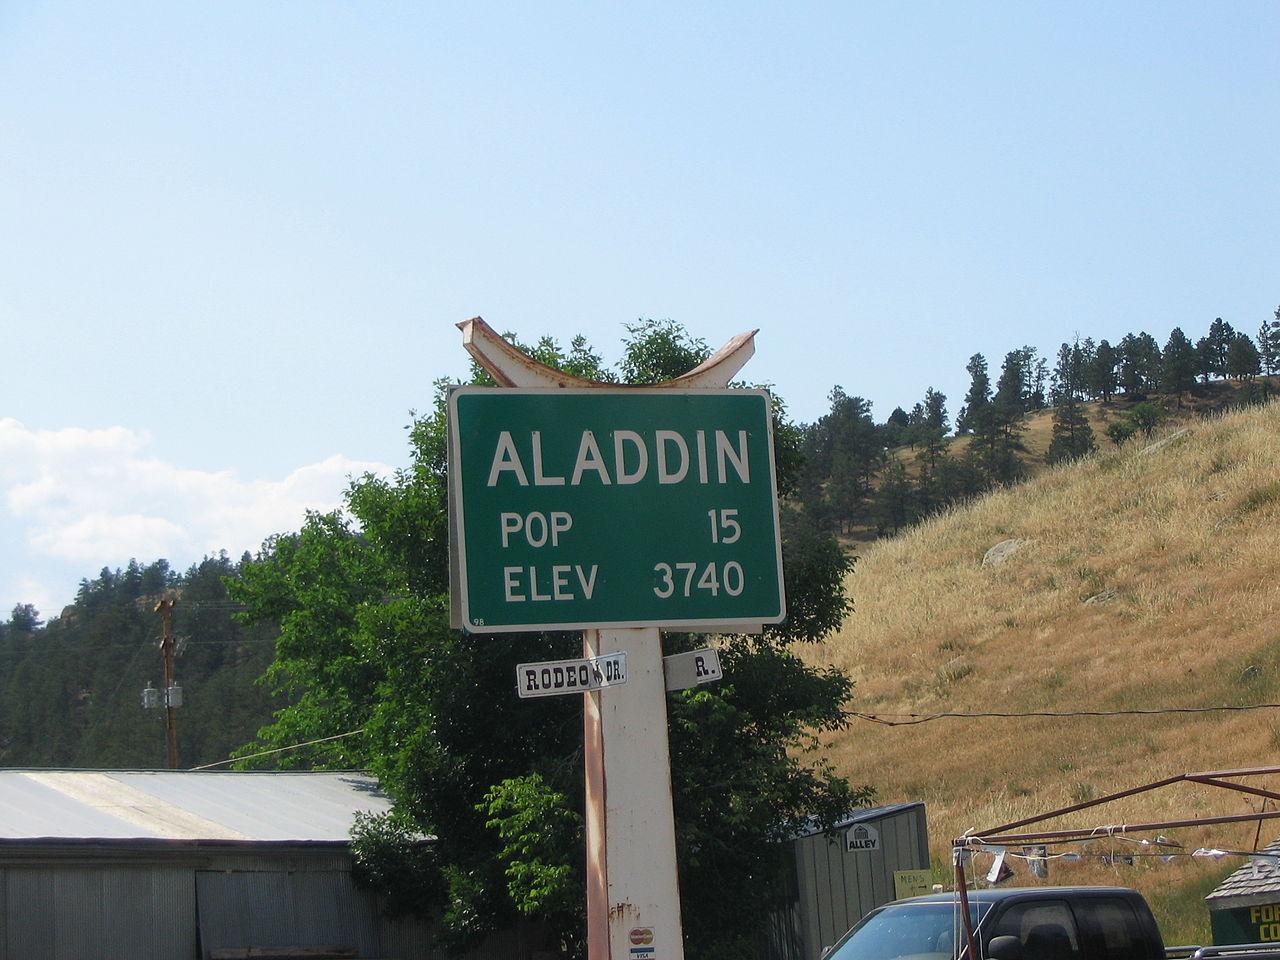 Aladdin, Wyoming population sign